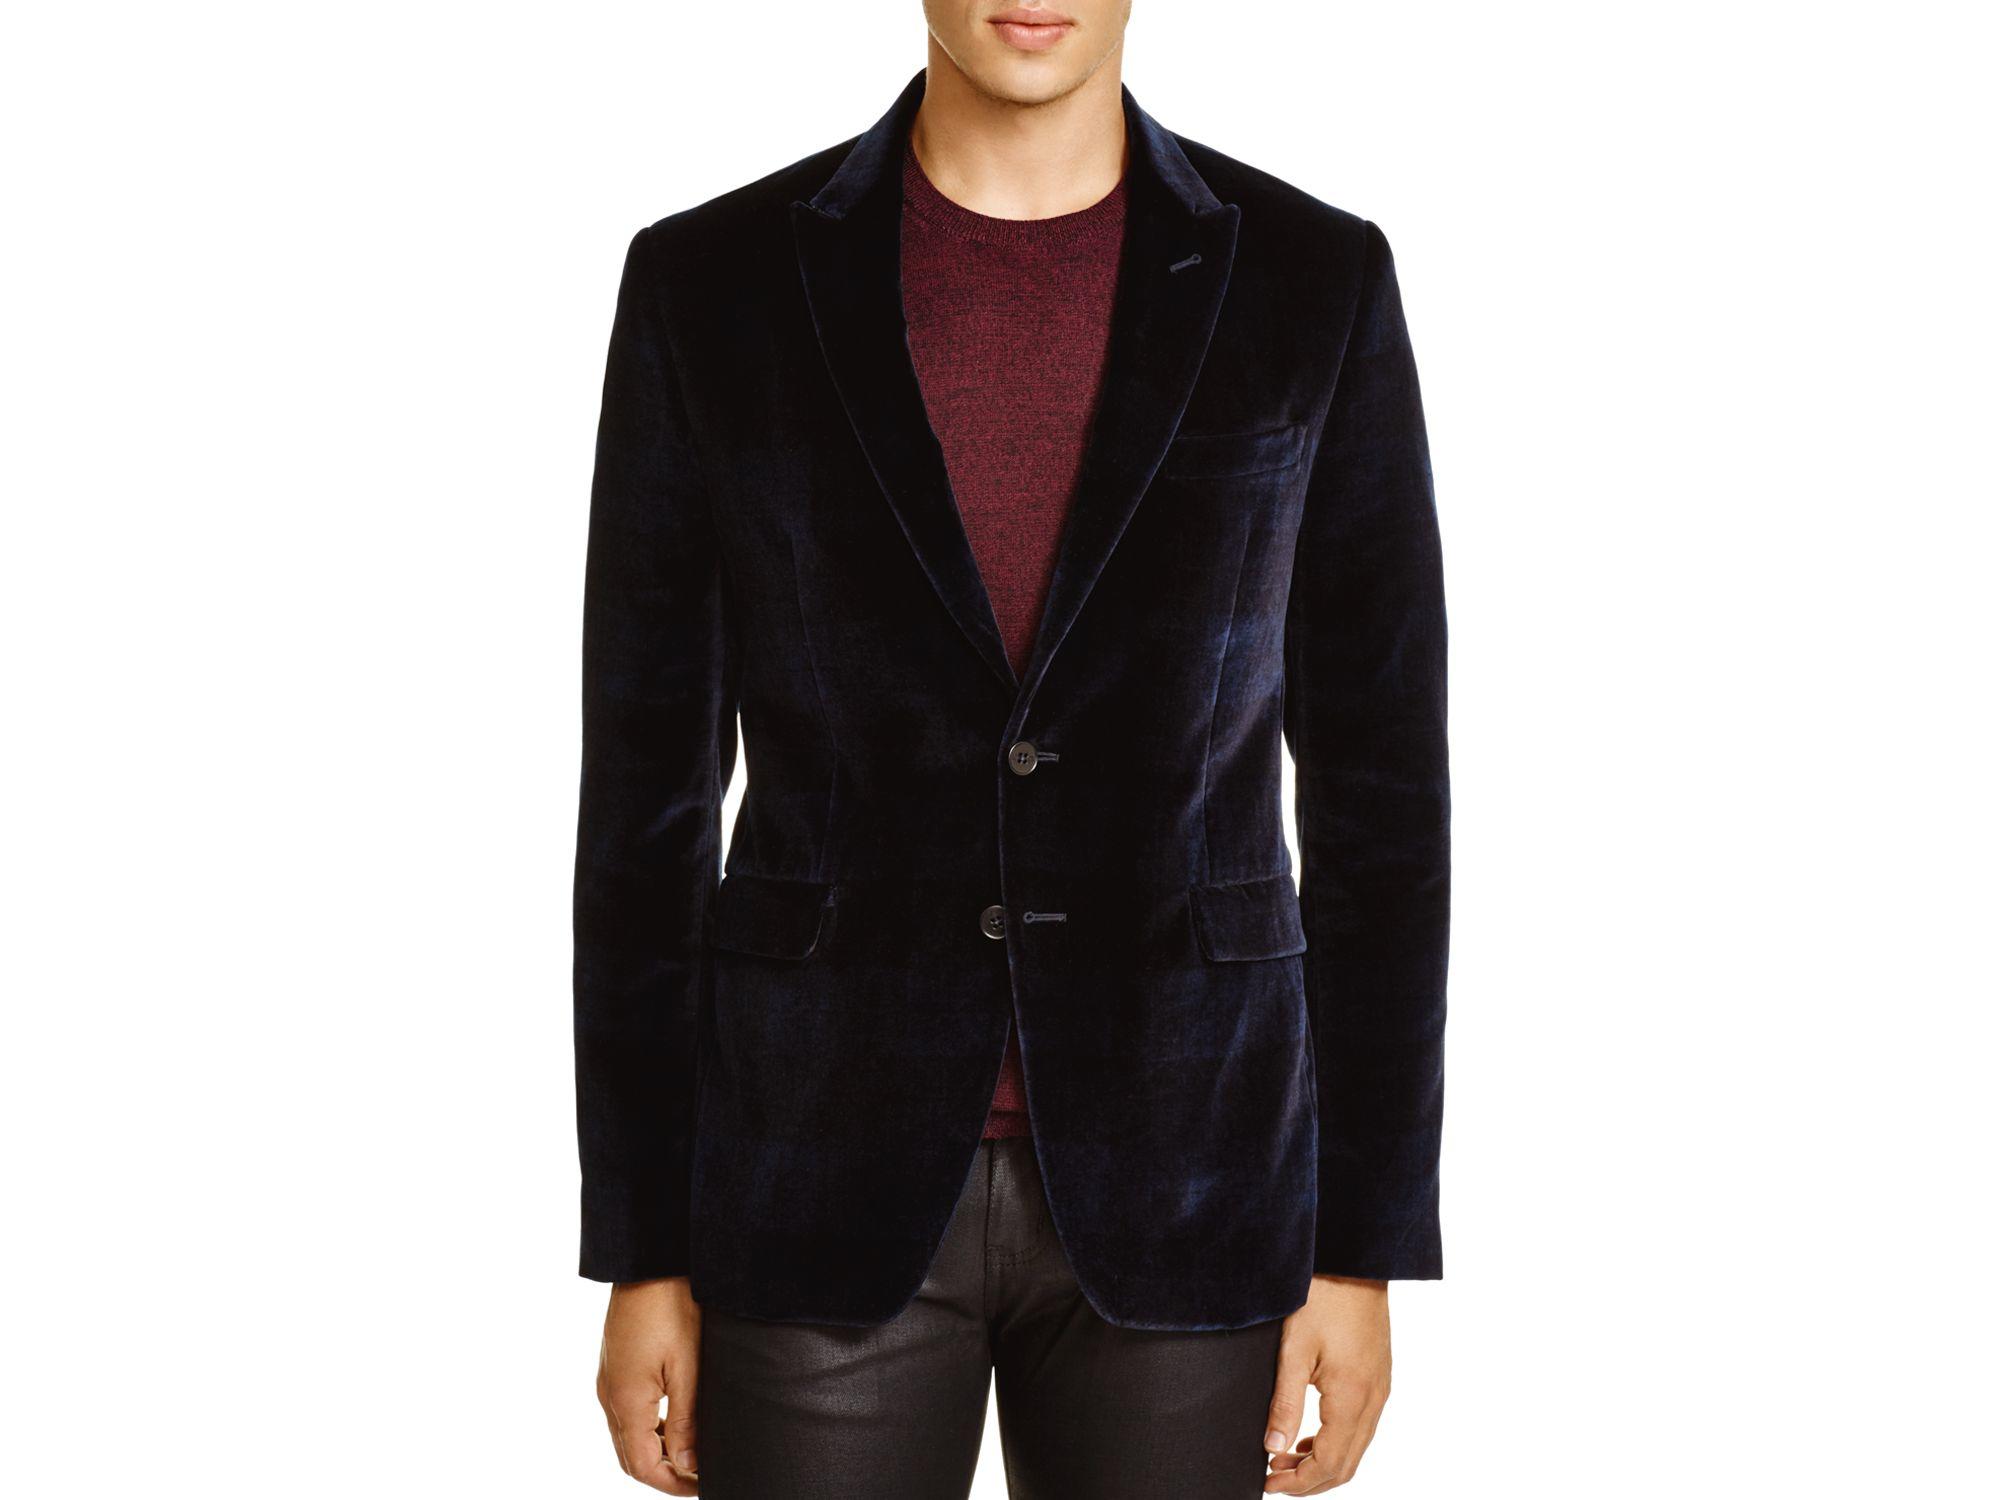 paul smith velvet slim fit blazer in blue for men lyst. Black Bedroom Furniture Sets. Home Design Ideas